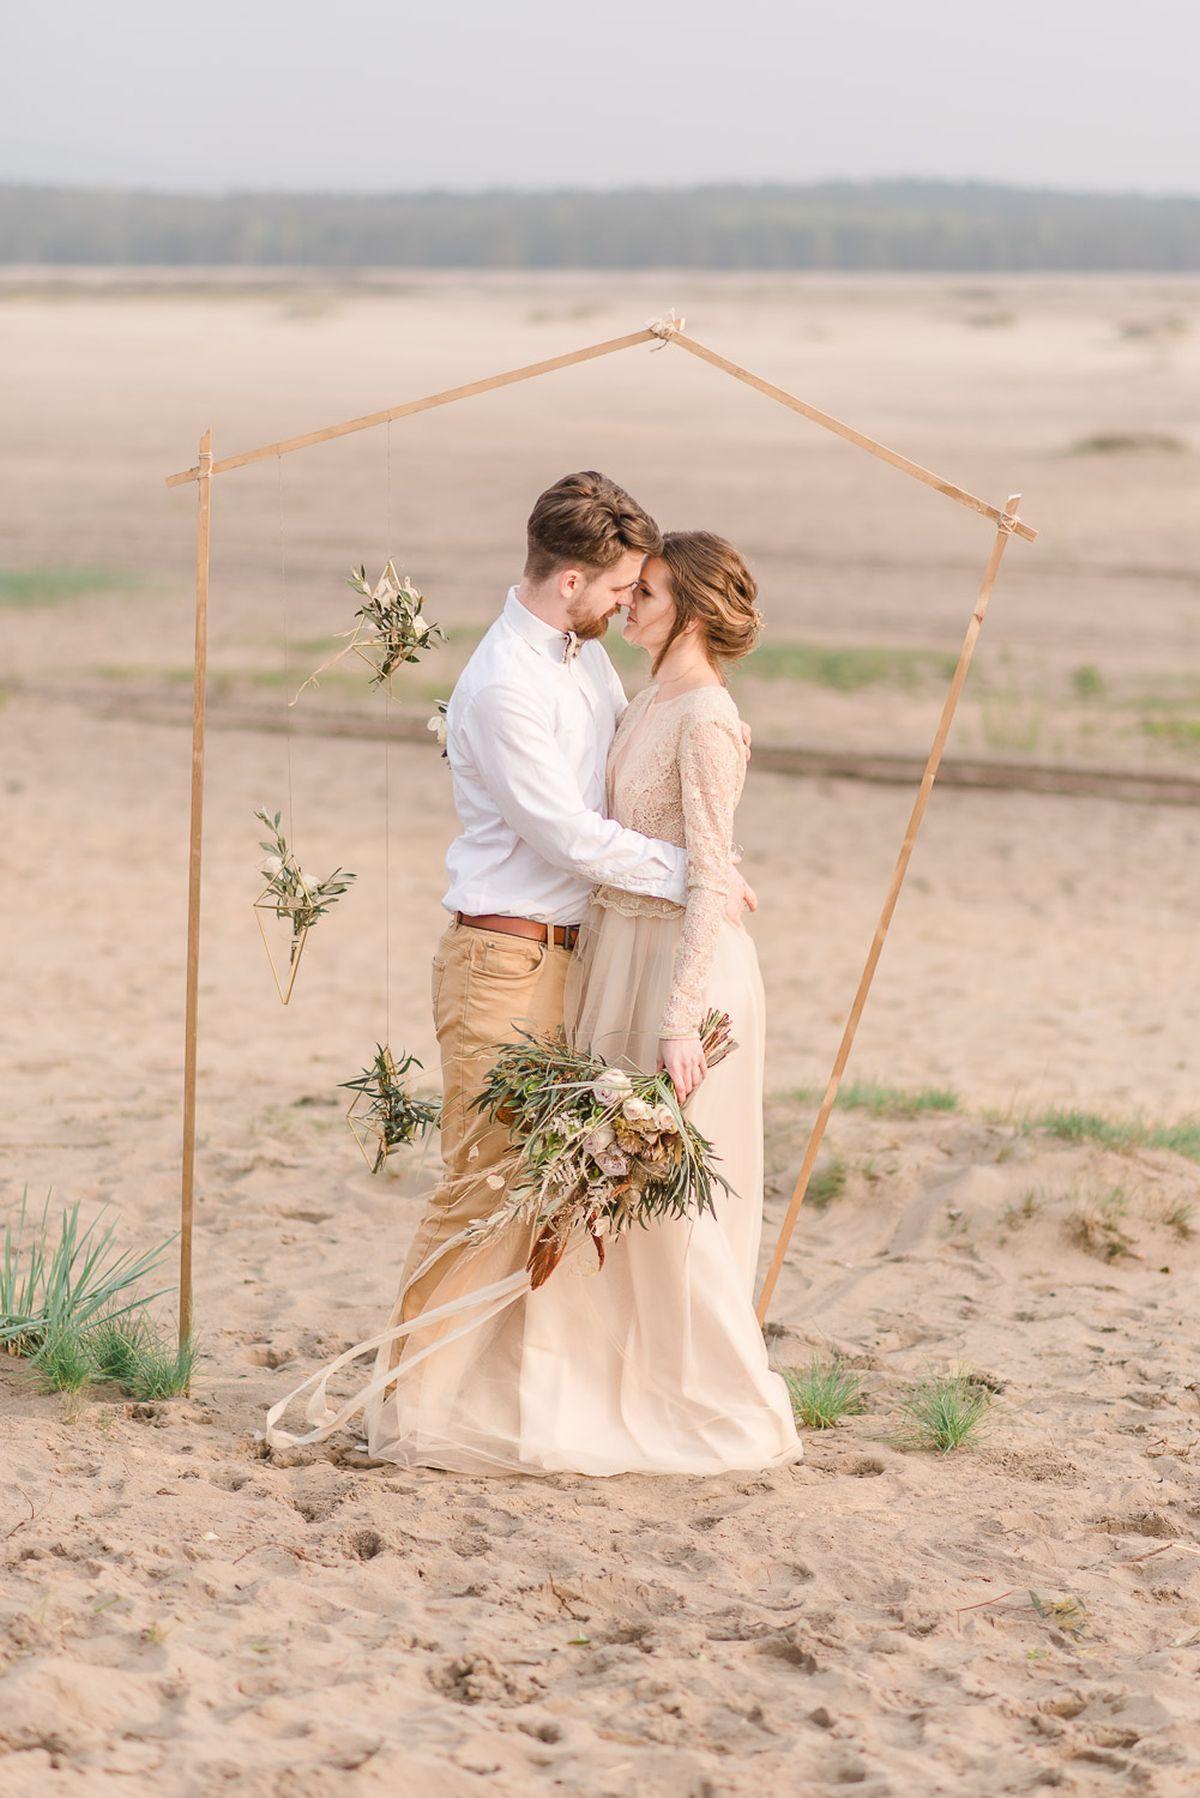 aschaaa-photography-wedding-shoot-wüste (100)